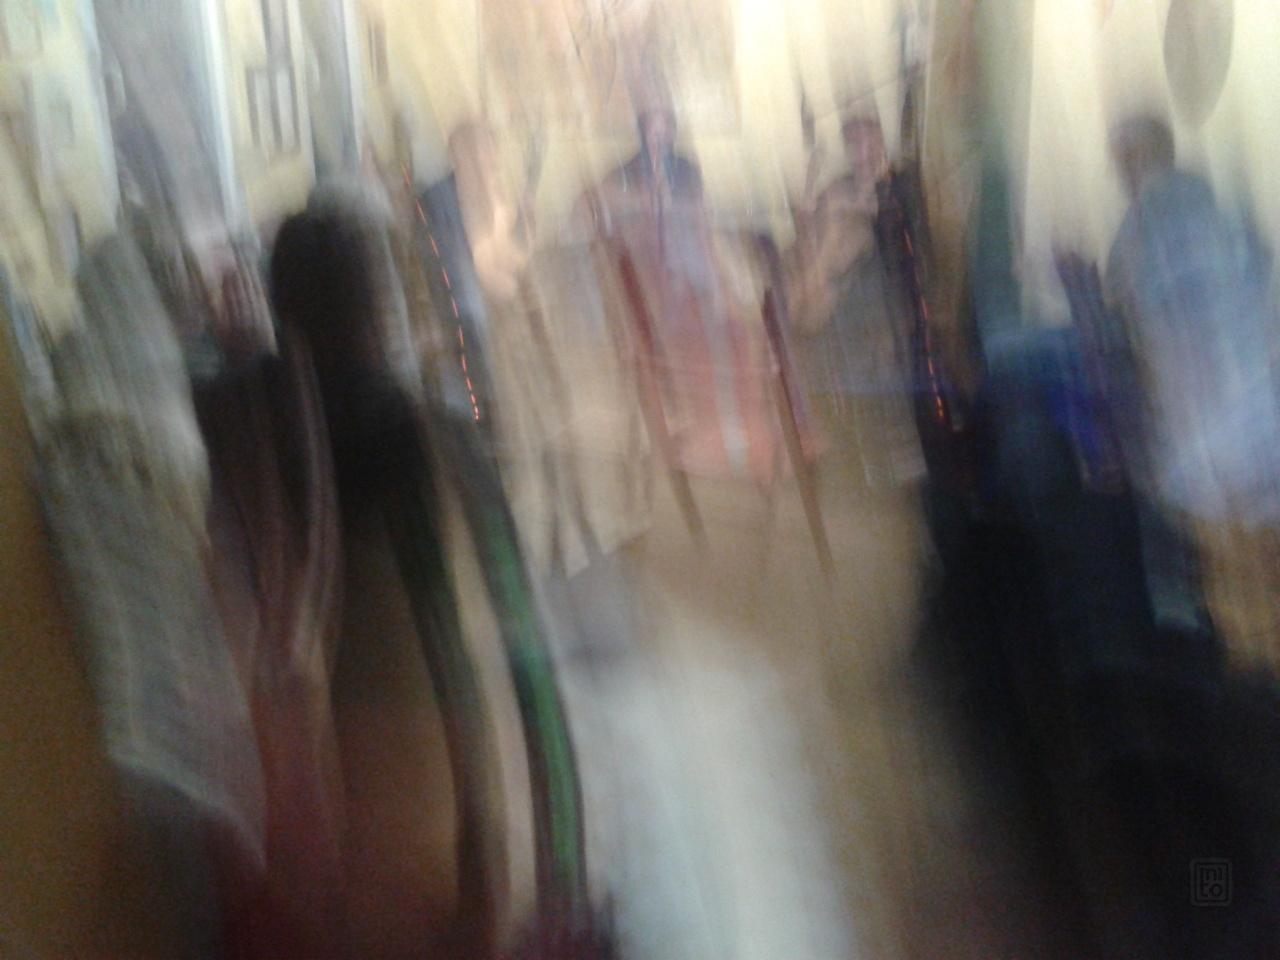 Psychedelic Folk II by mitoXD